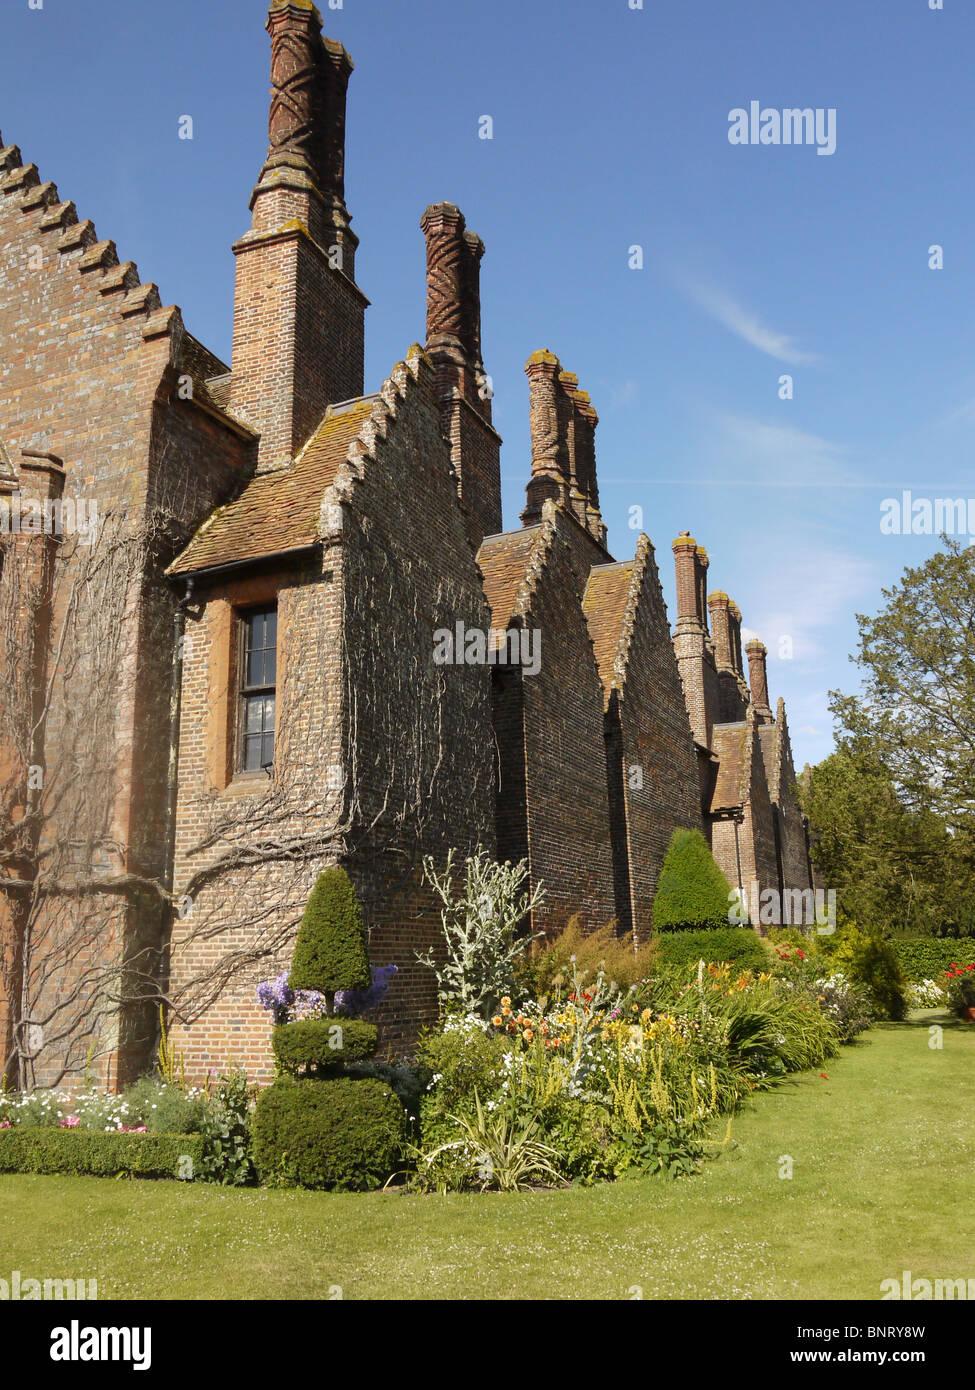 chenies manor house and garden, chenies, buckinghamshire, uk stock